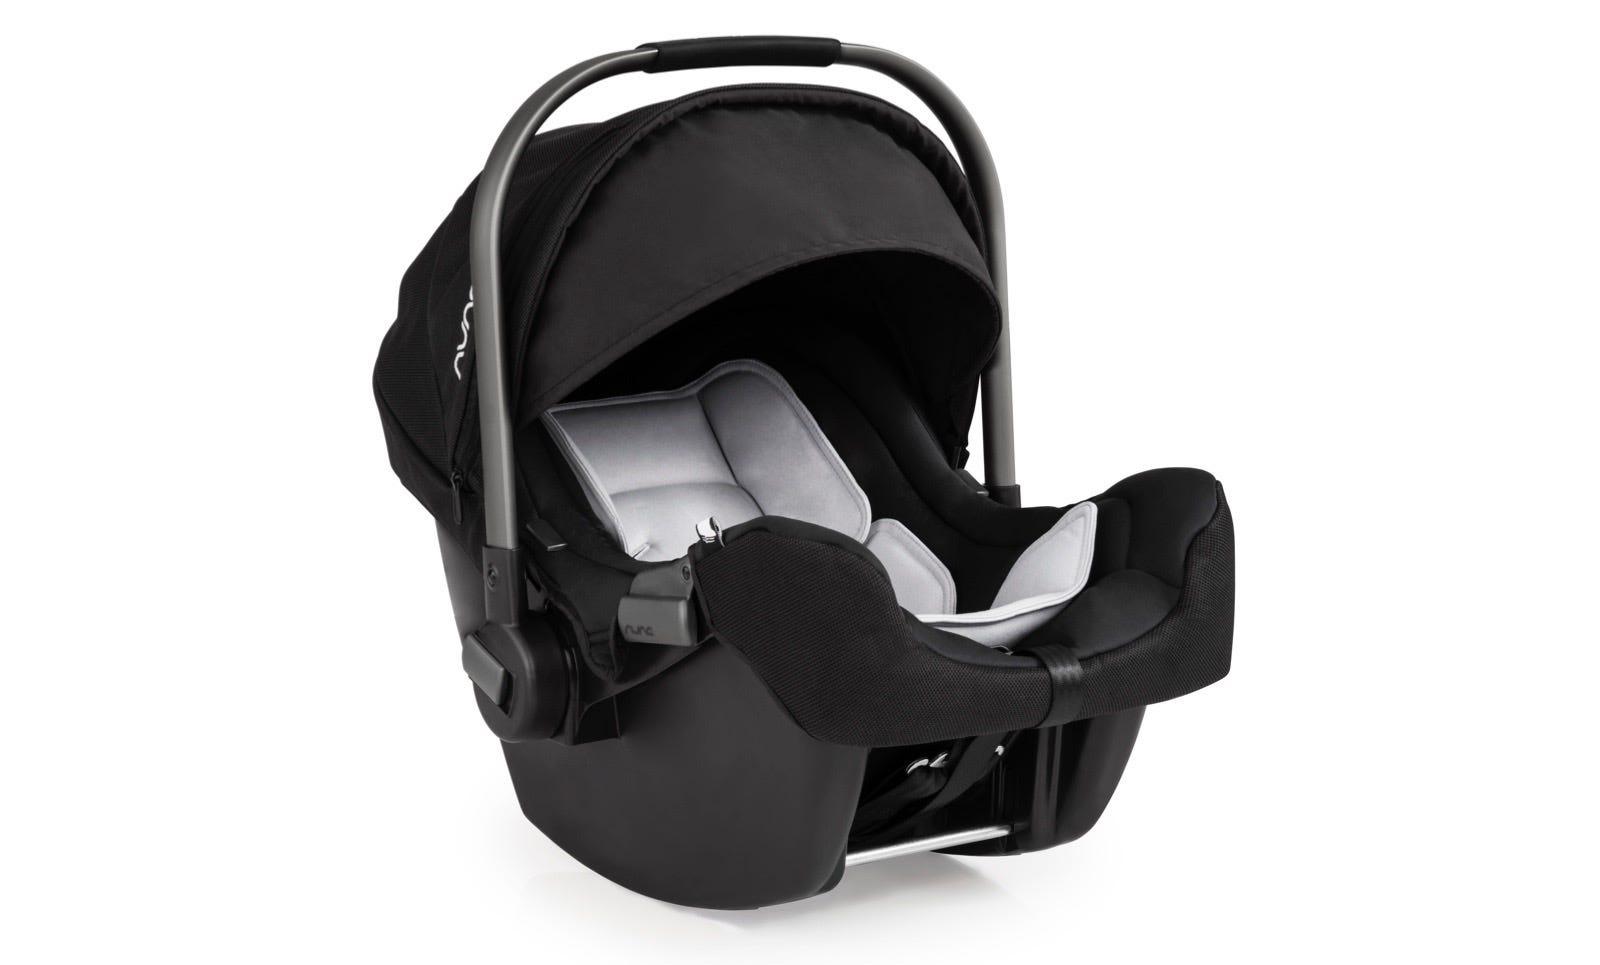 The Pipa Nuna infant car seat.